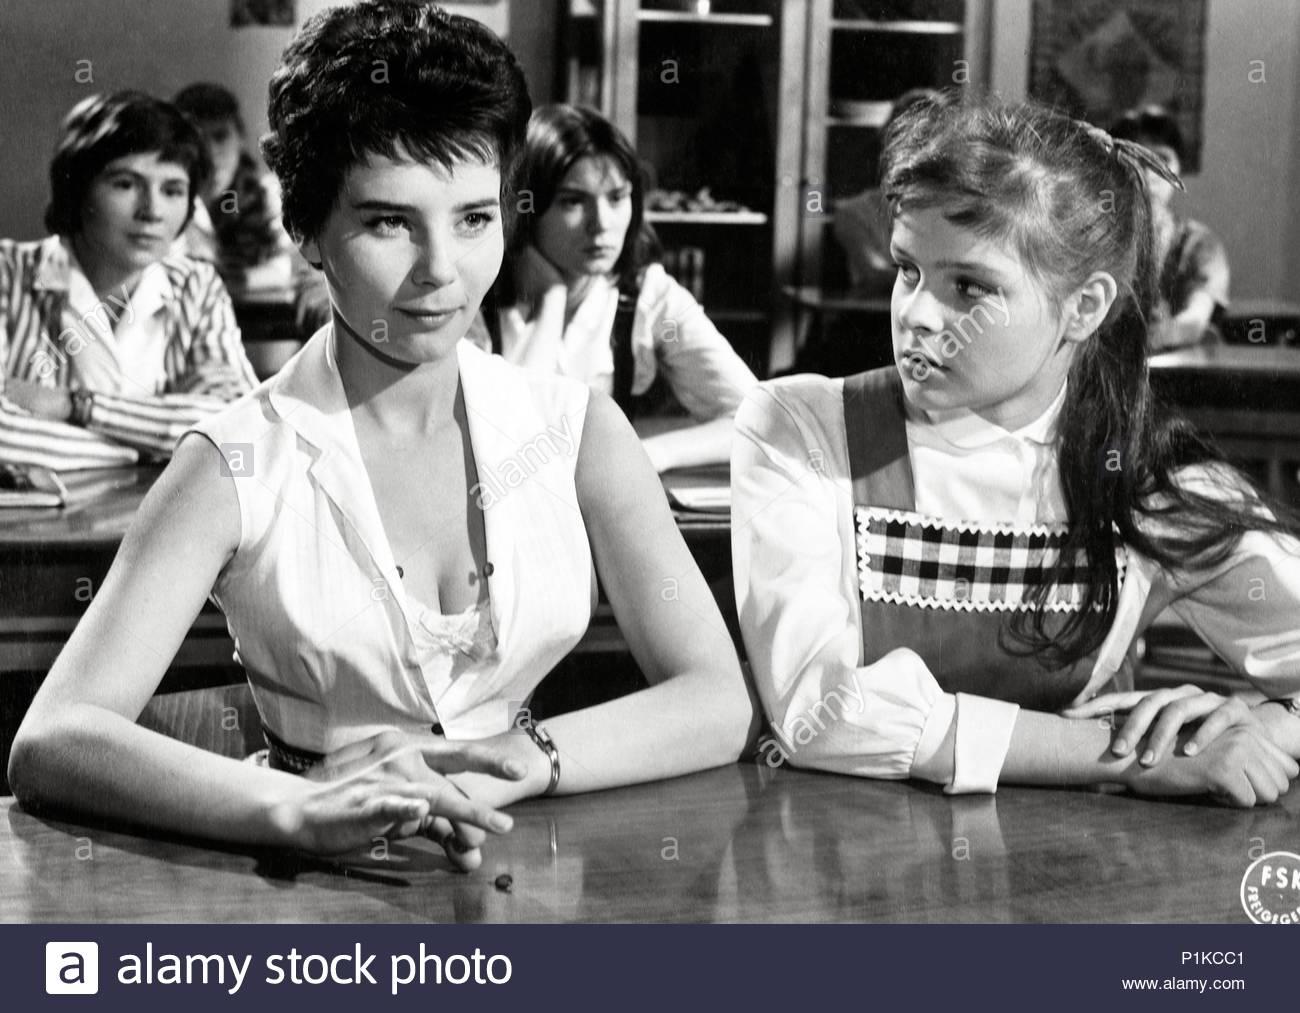 Original Film Title: SCHMUTZIGER ENGEL.  English Title: IMPERFECT ANGEL.  Film Director: ALFRED VOHRER.  Year: 1958.  Stars: CORNY COLLINS. Credit: ULTRA FILM / Album - Stock Image